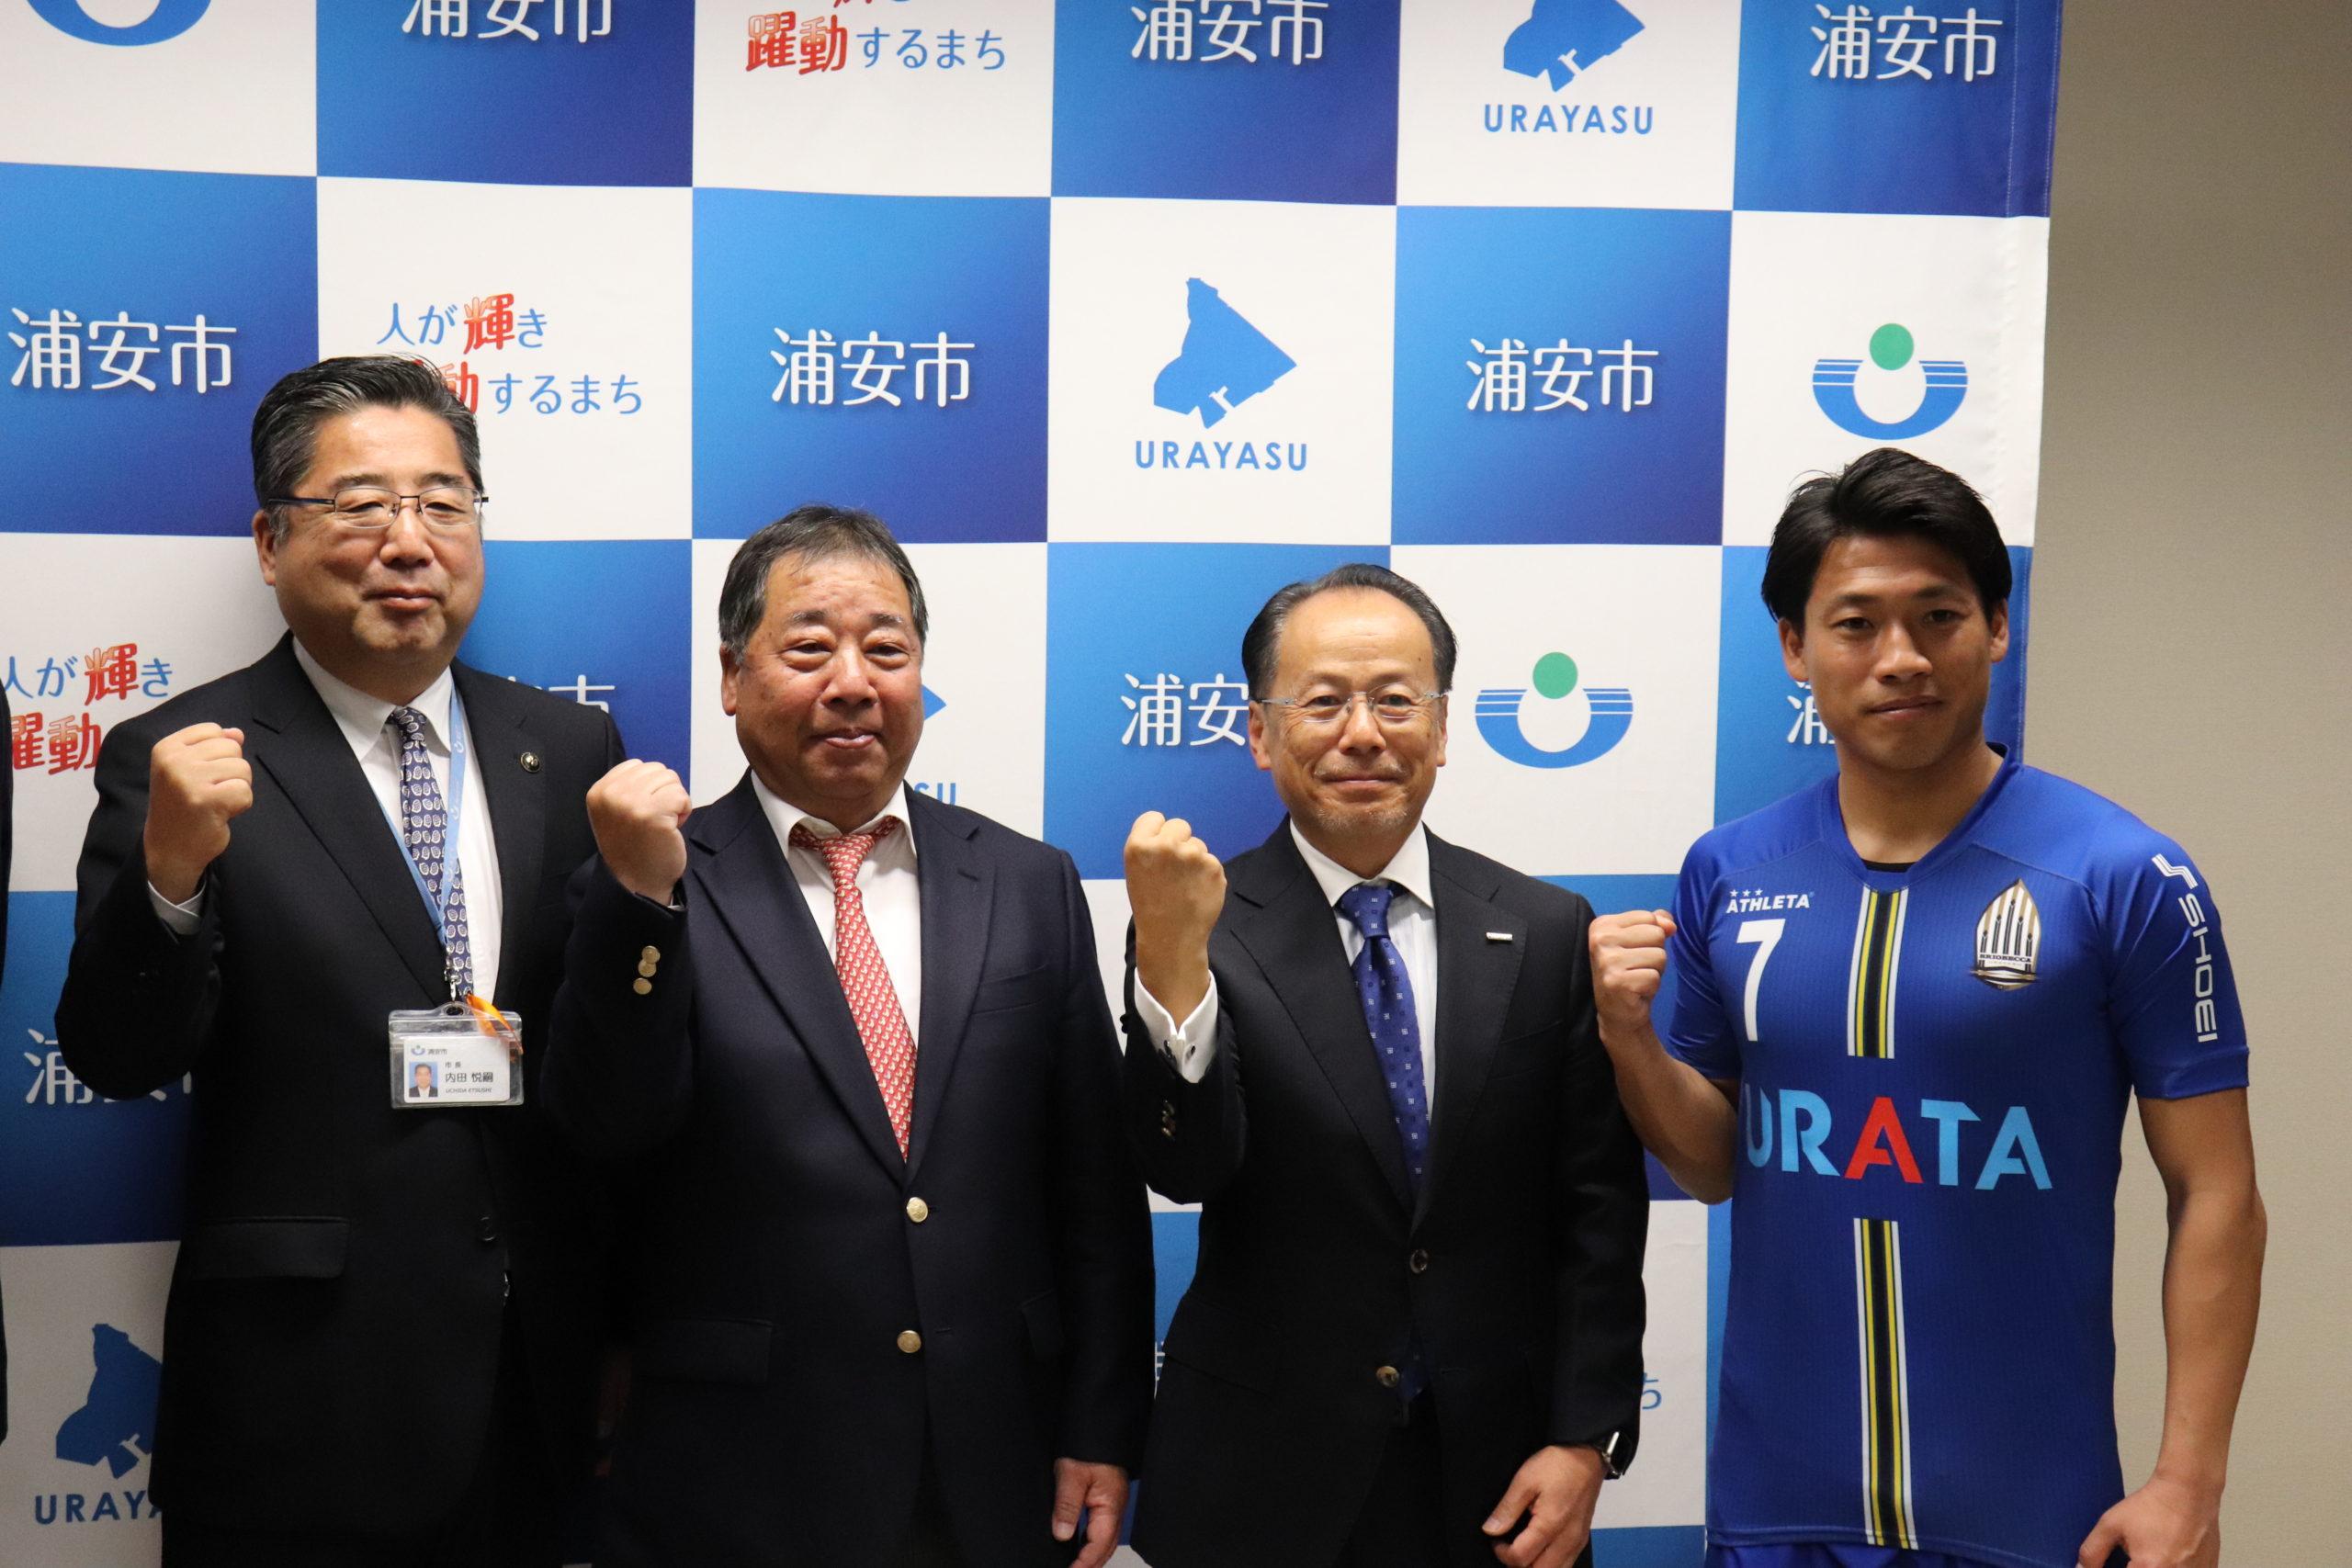 REPORT:浦安市と浦安市サッカー協会、バルドラール浦安、ブリオベッカ浦安の4者間にて相互連携・支援協力に関する協定を締結